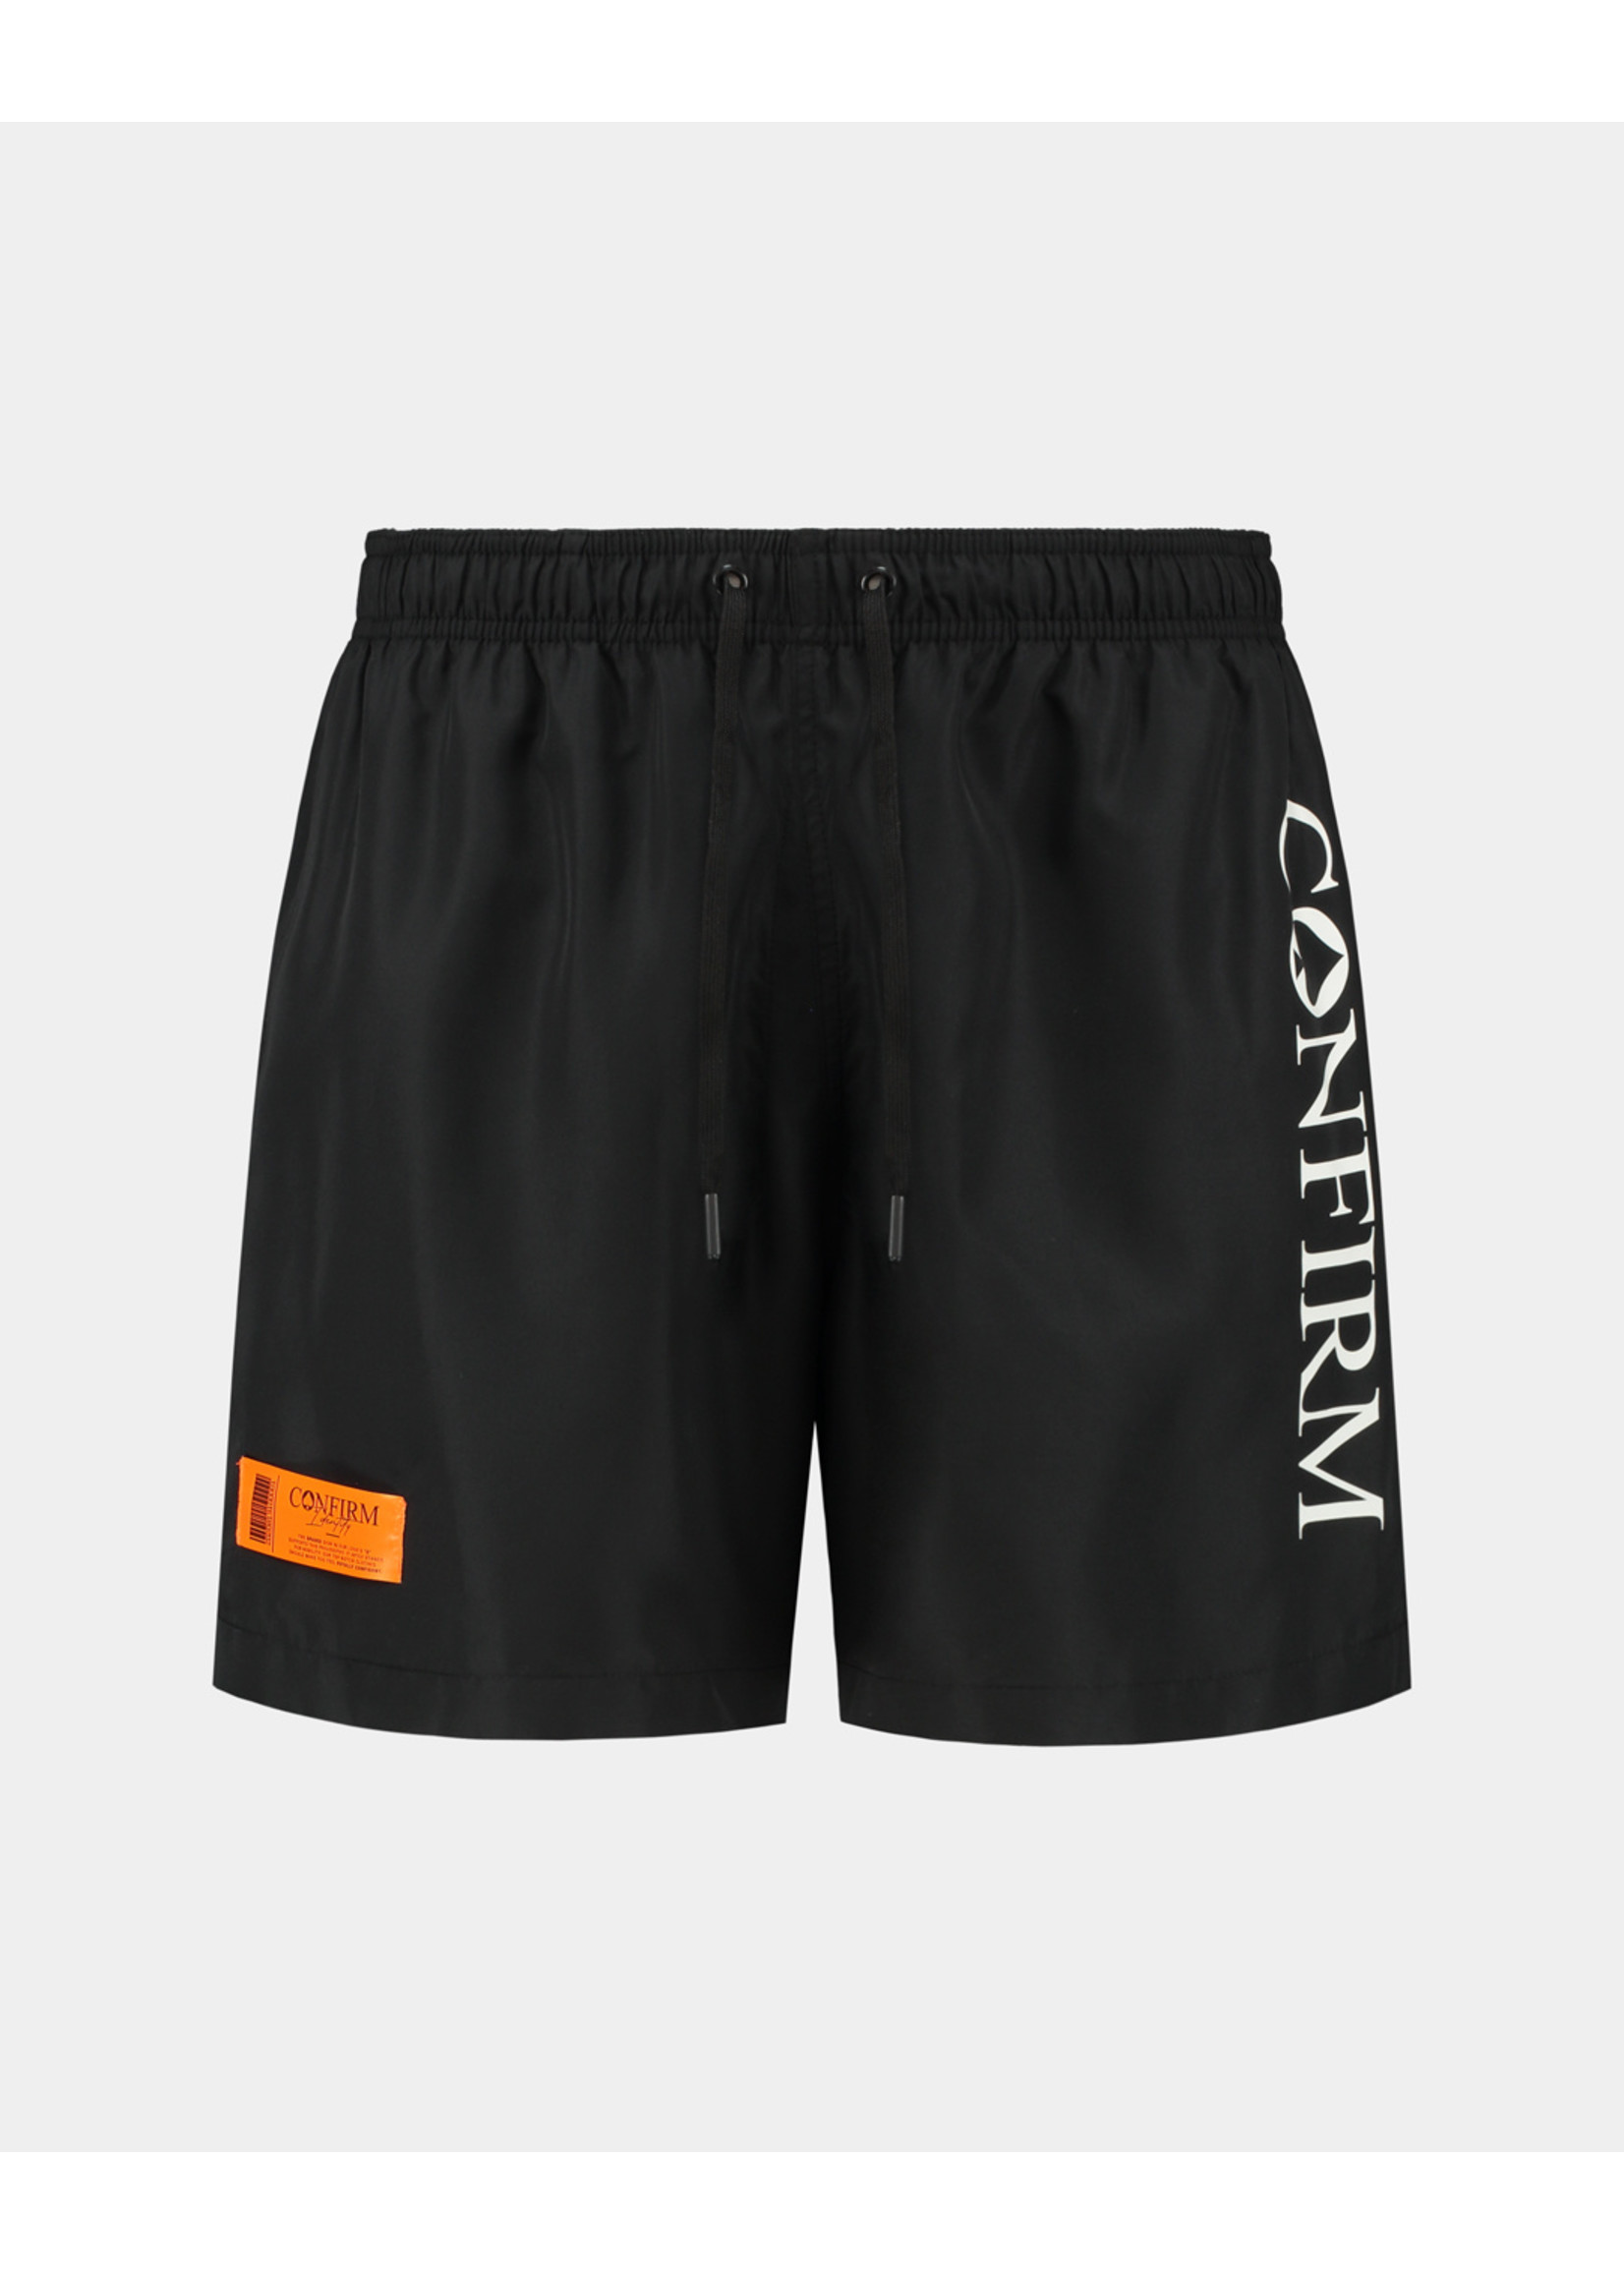 Confirm brand zwembroek O.G. - zwart/oranje